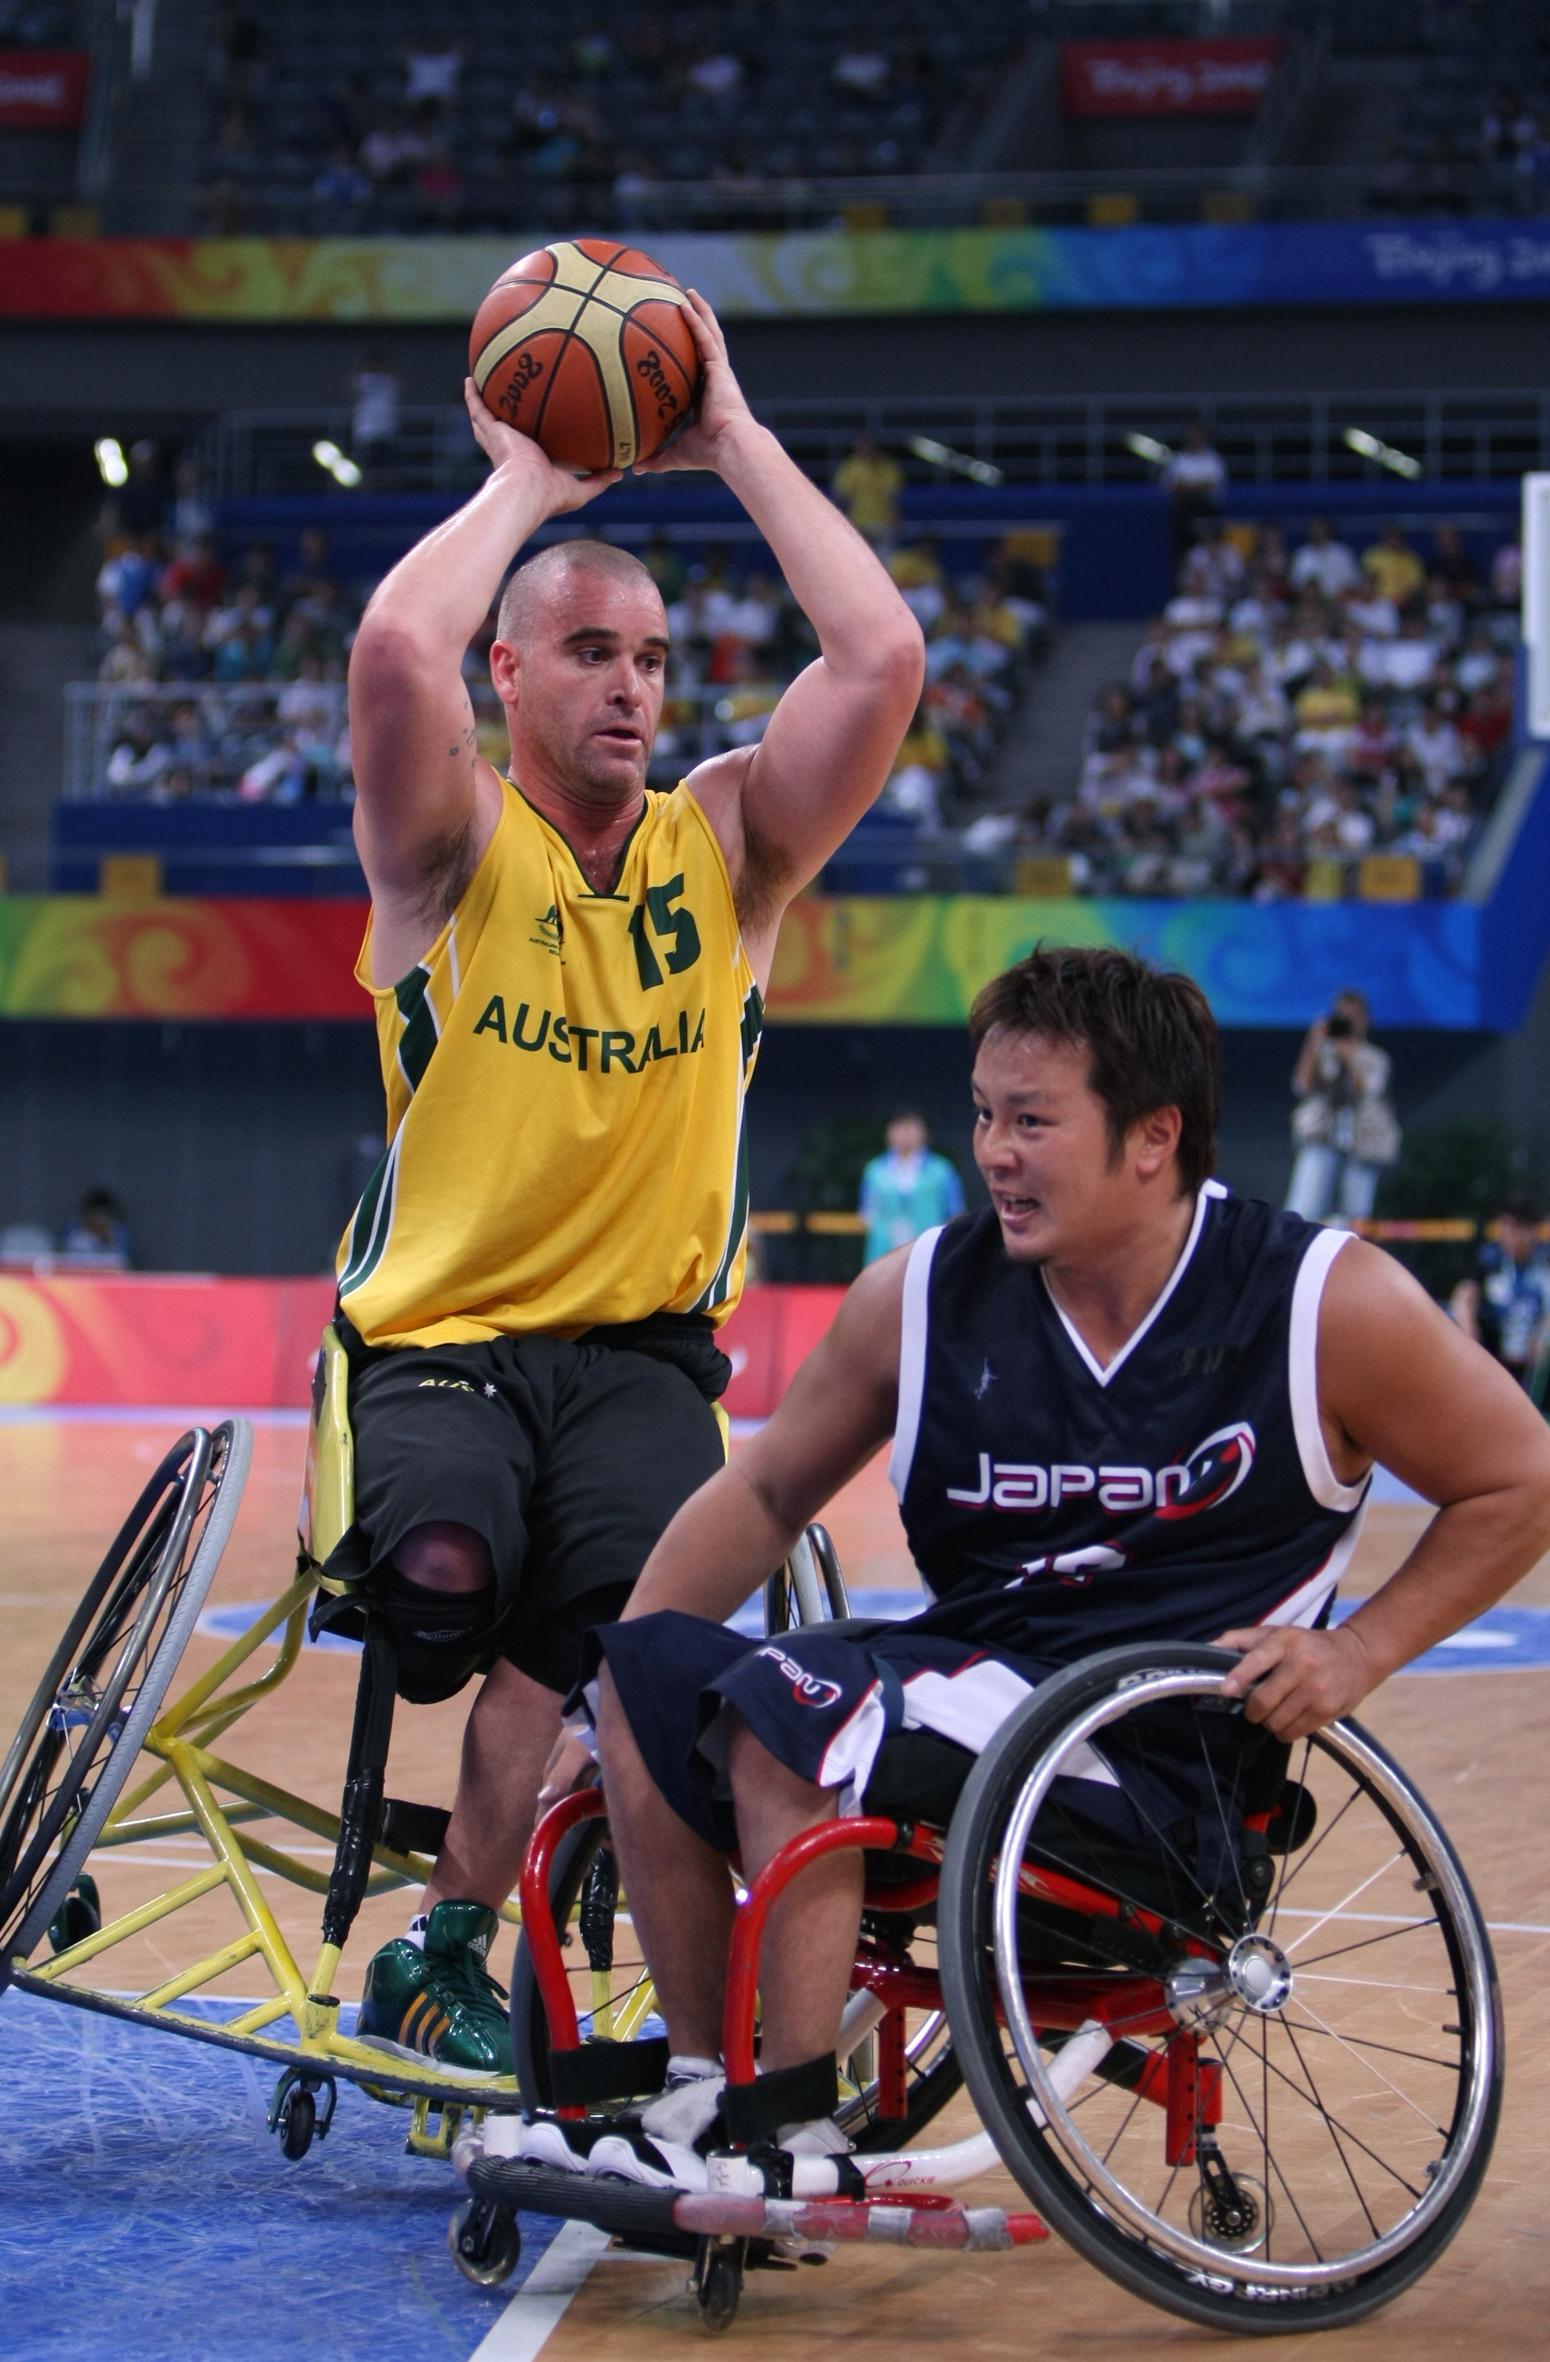 File:130908 - Brad Ness on one wheel to pass vs Japan - 3b - crop